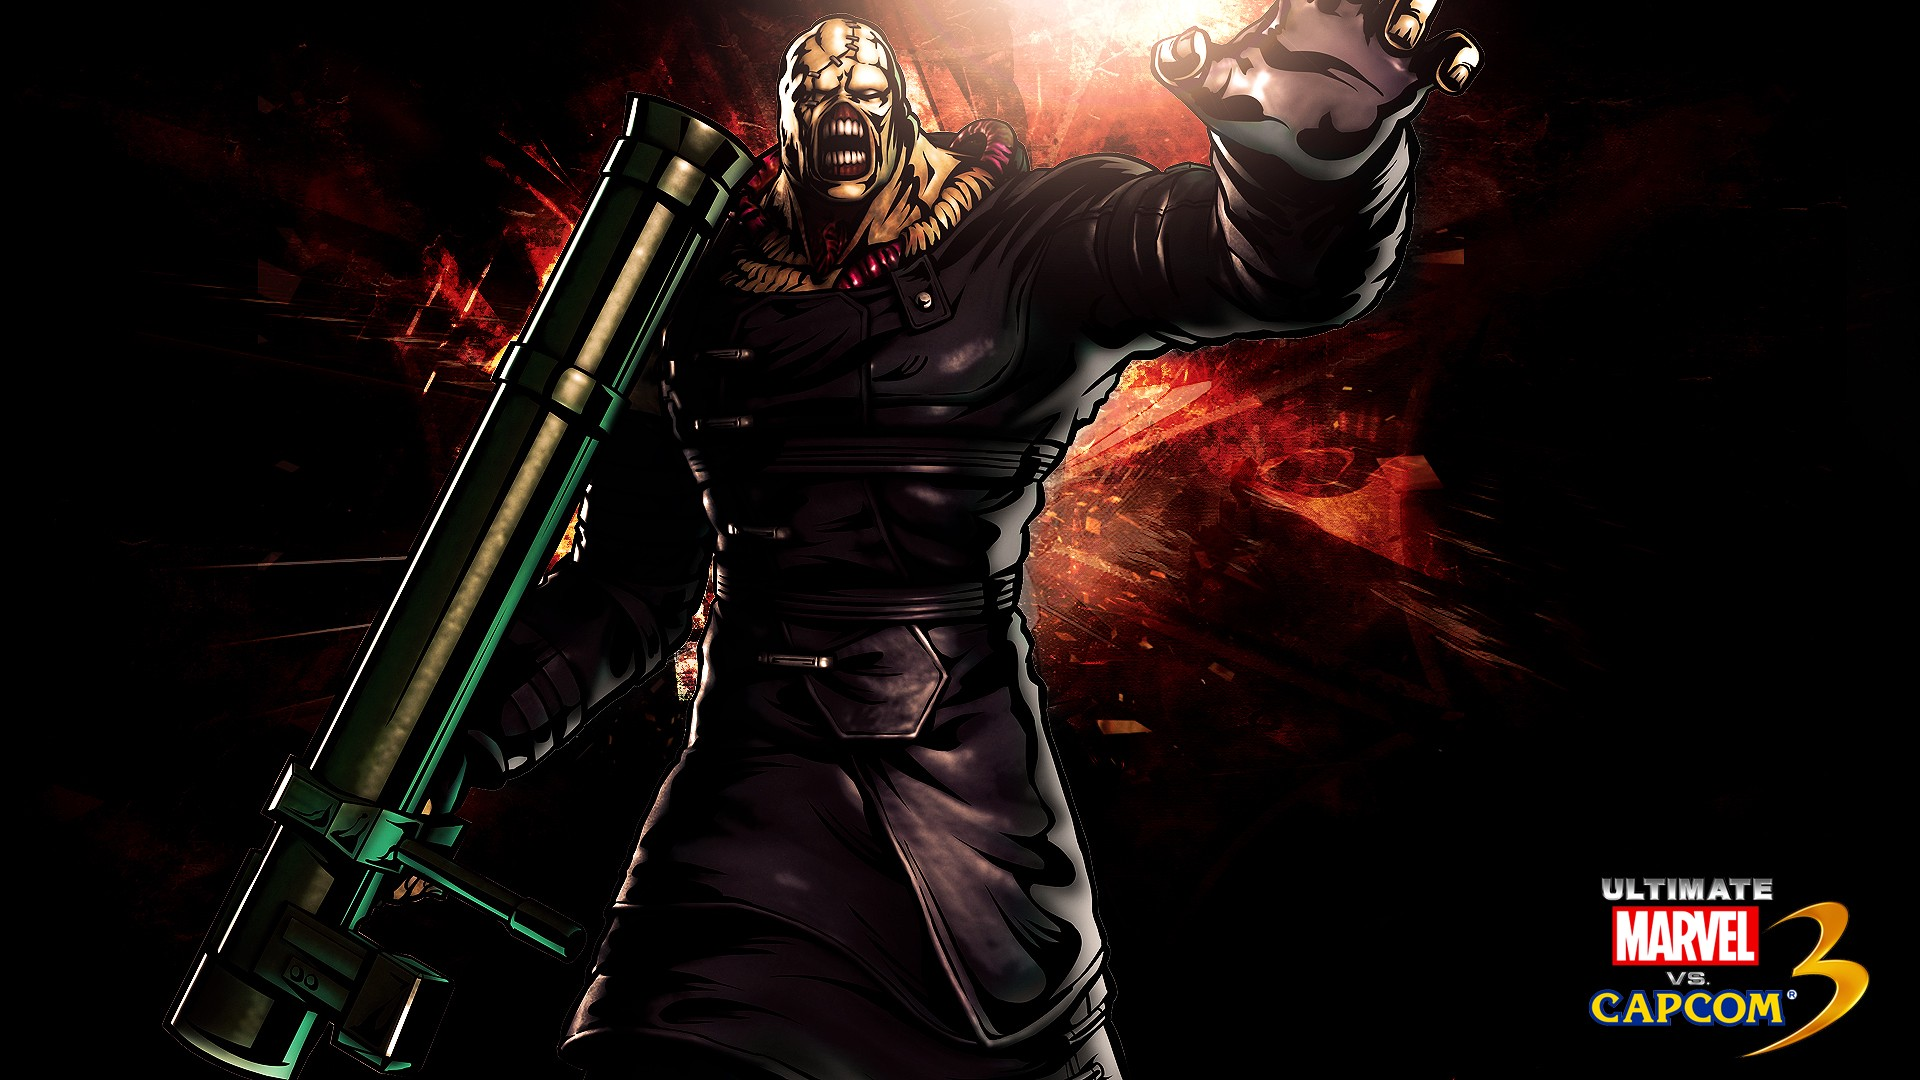 Download Wallpaper Resident Evil Nemesis iPhone Wallpaper Resident 1920x1080